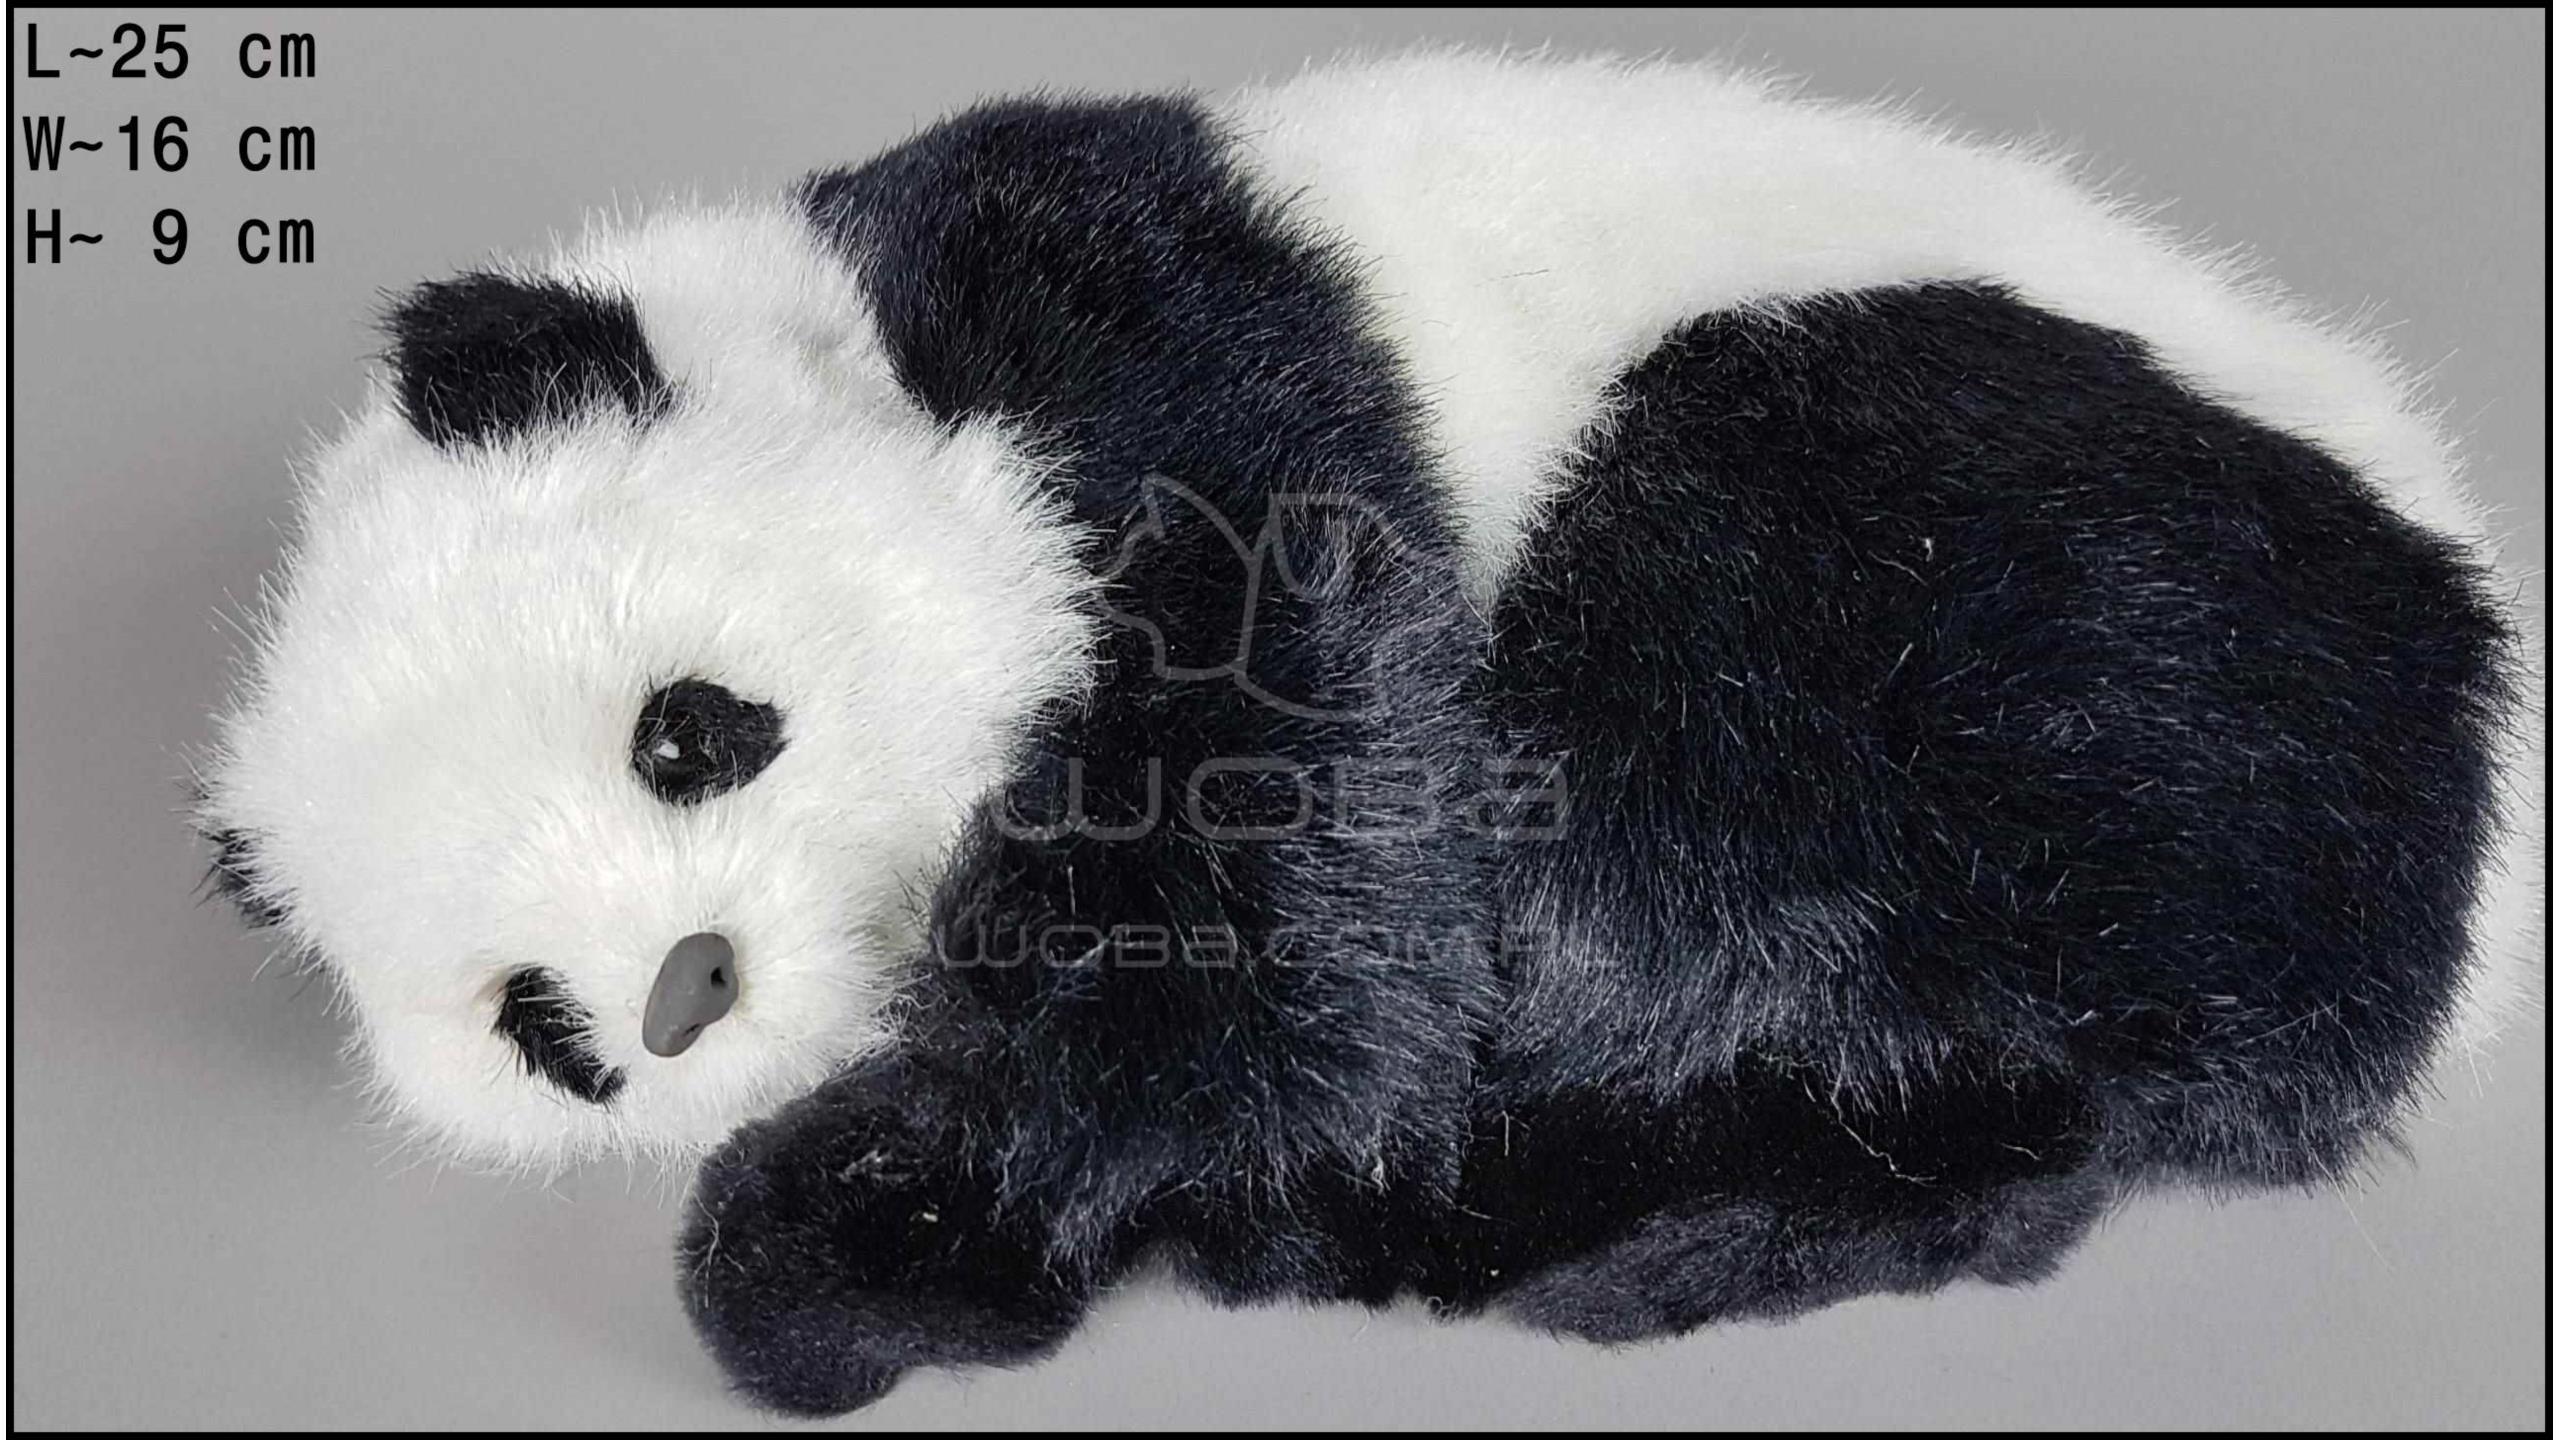 Panda - Lying